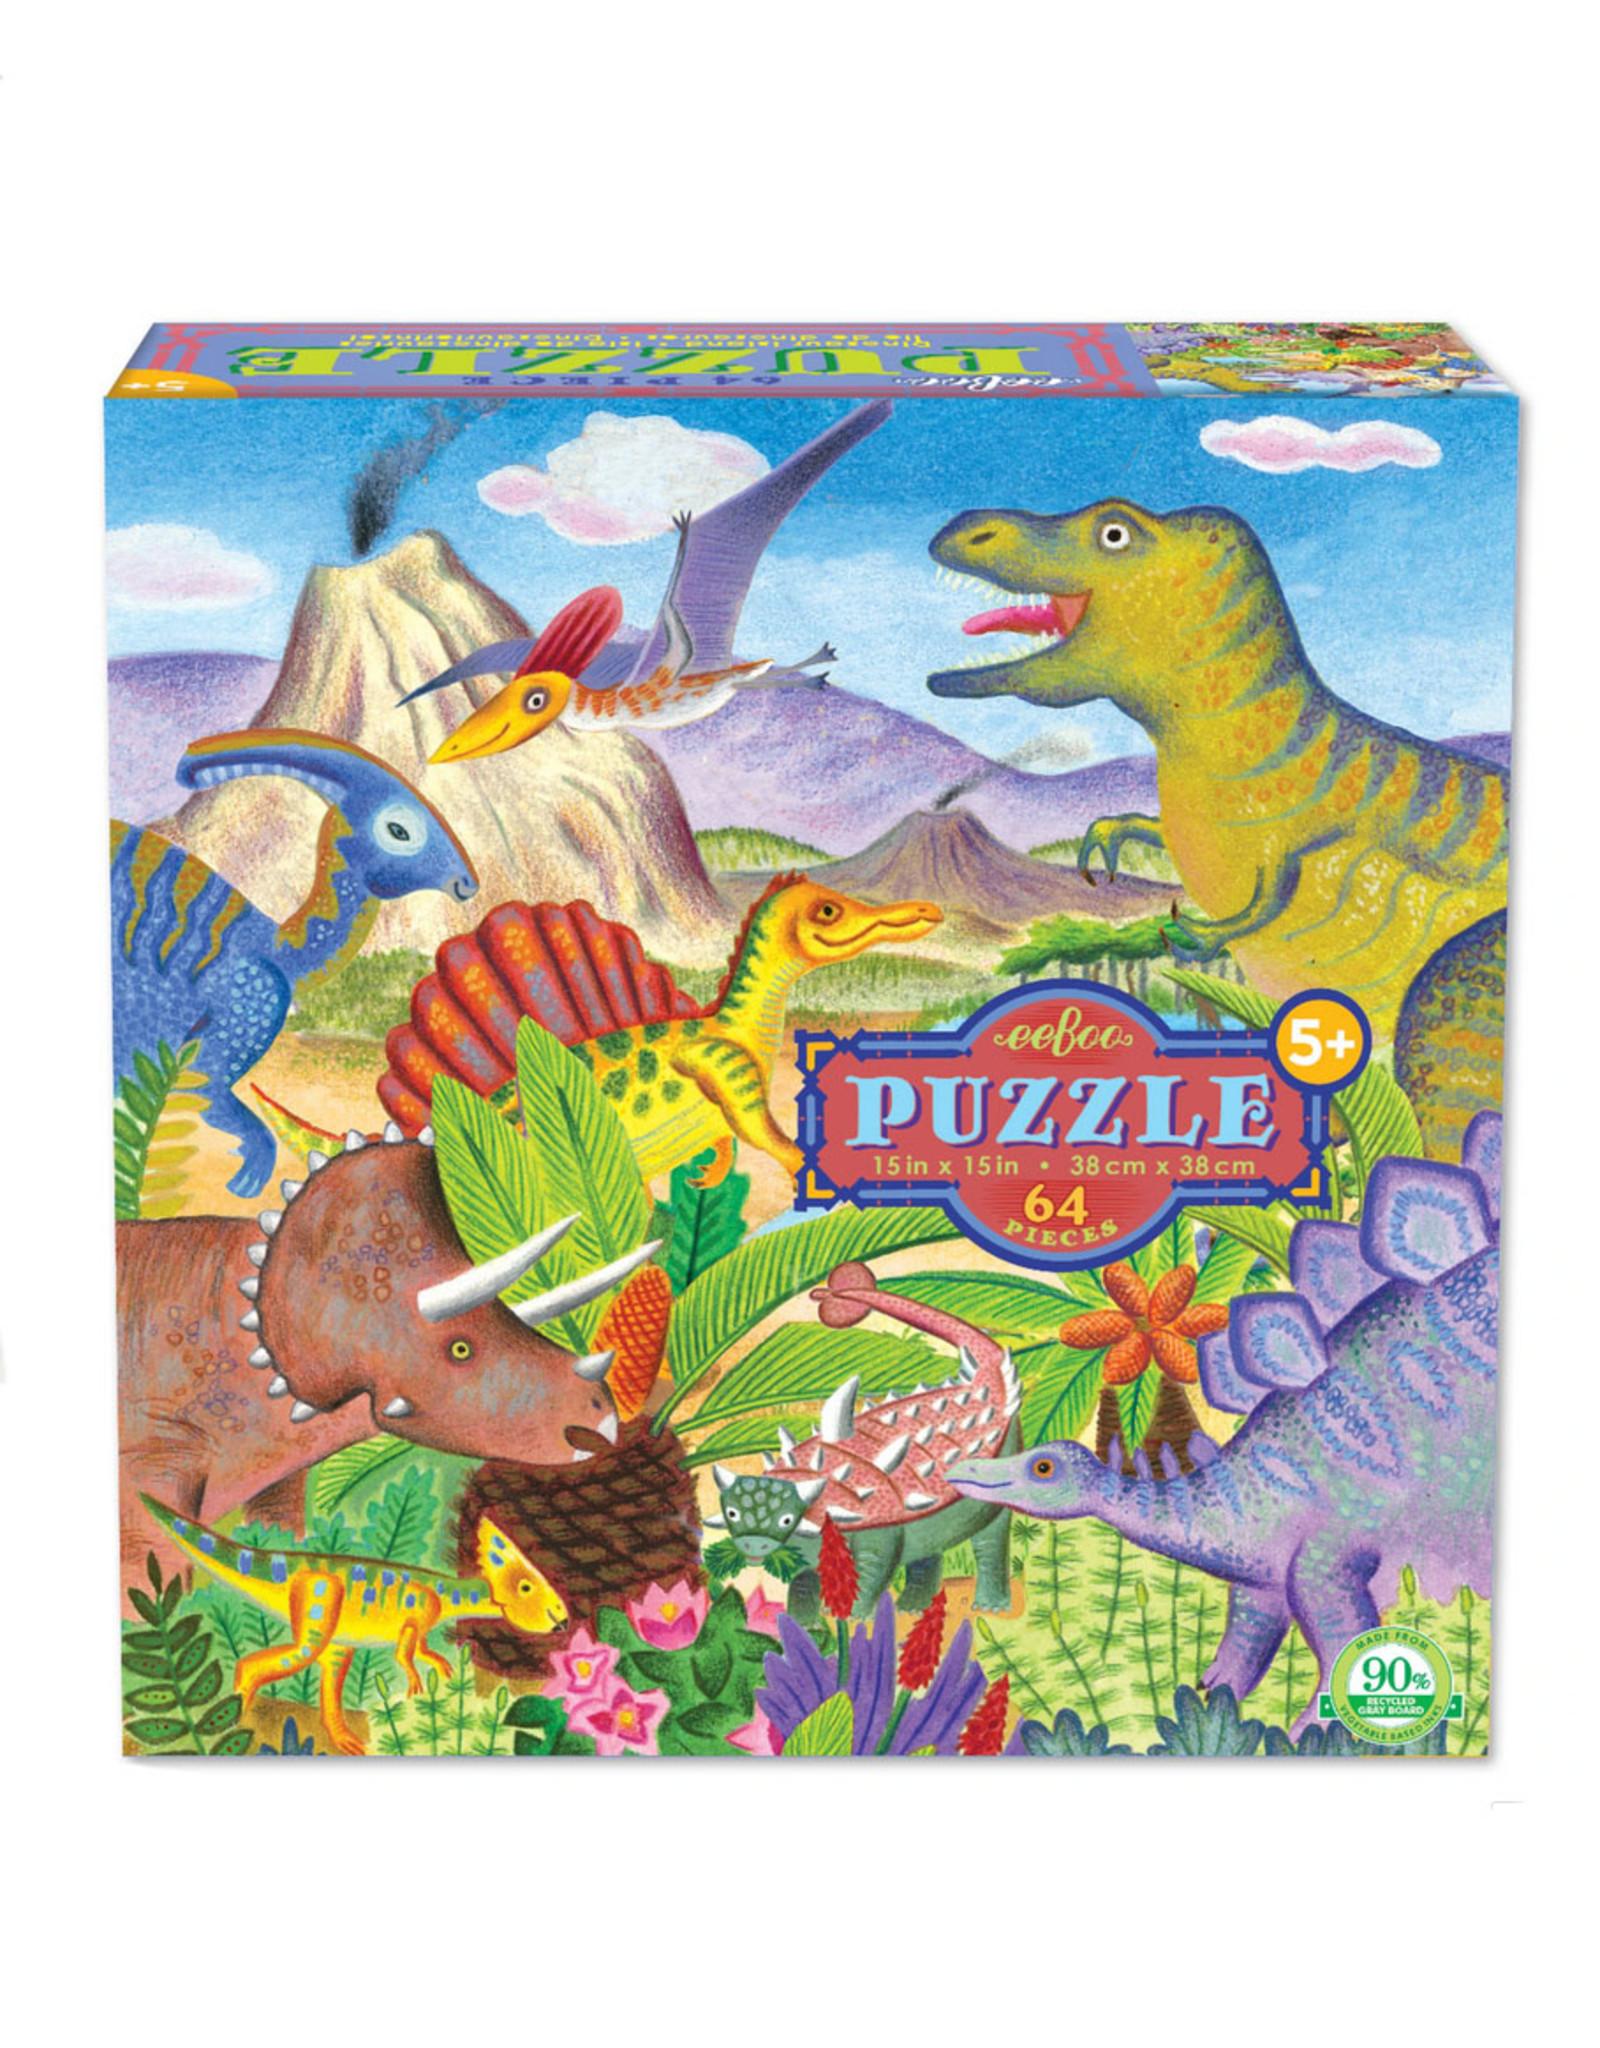 Puzzle: 64 piece dinosaur island